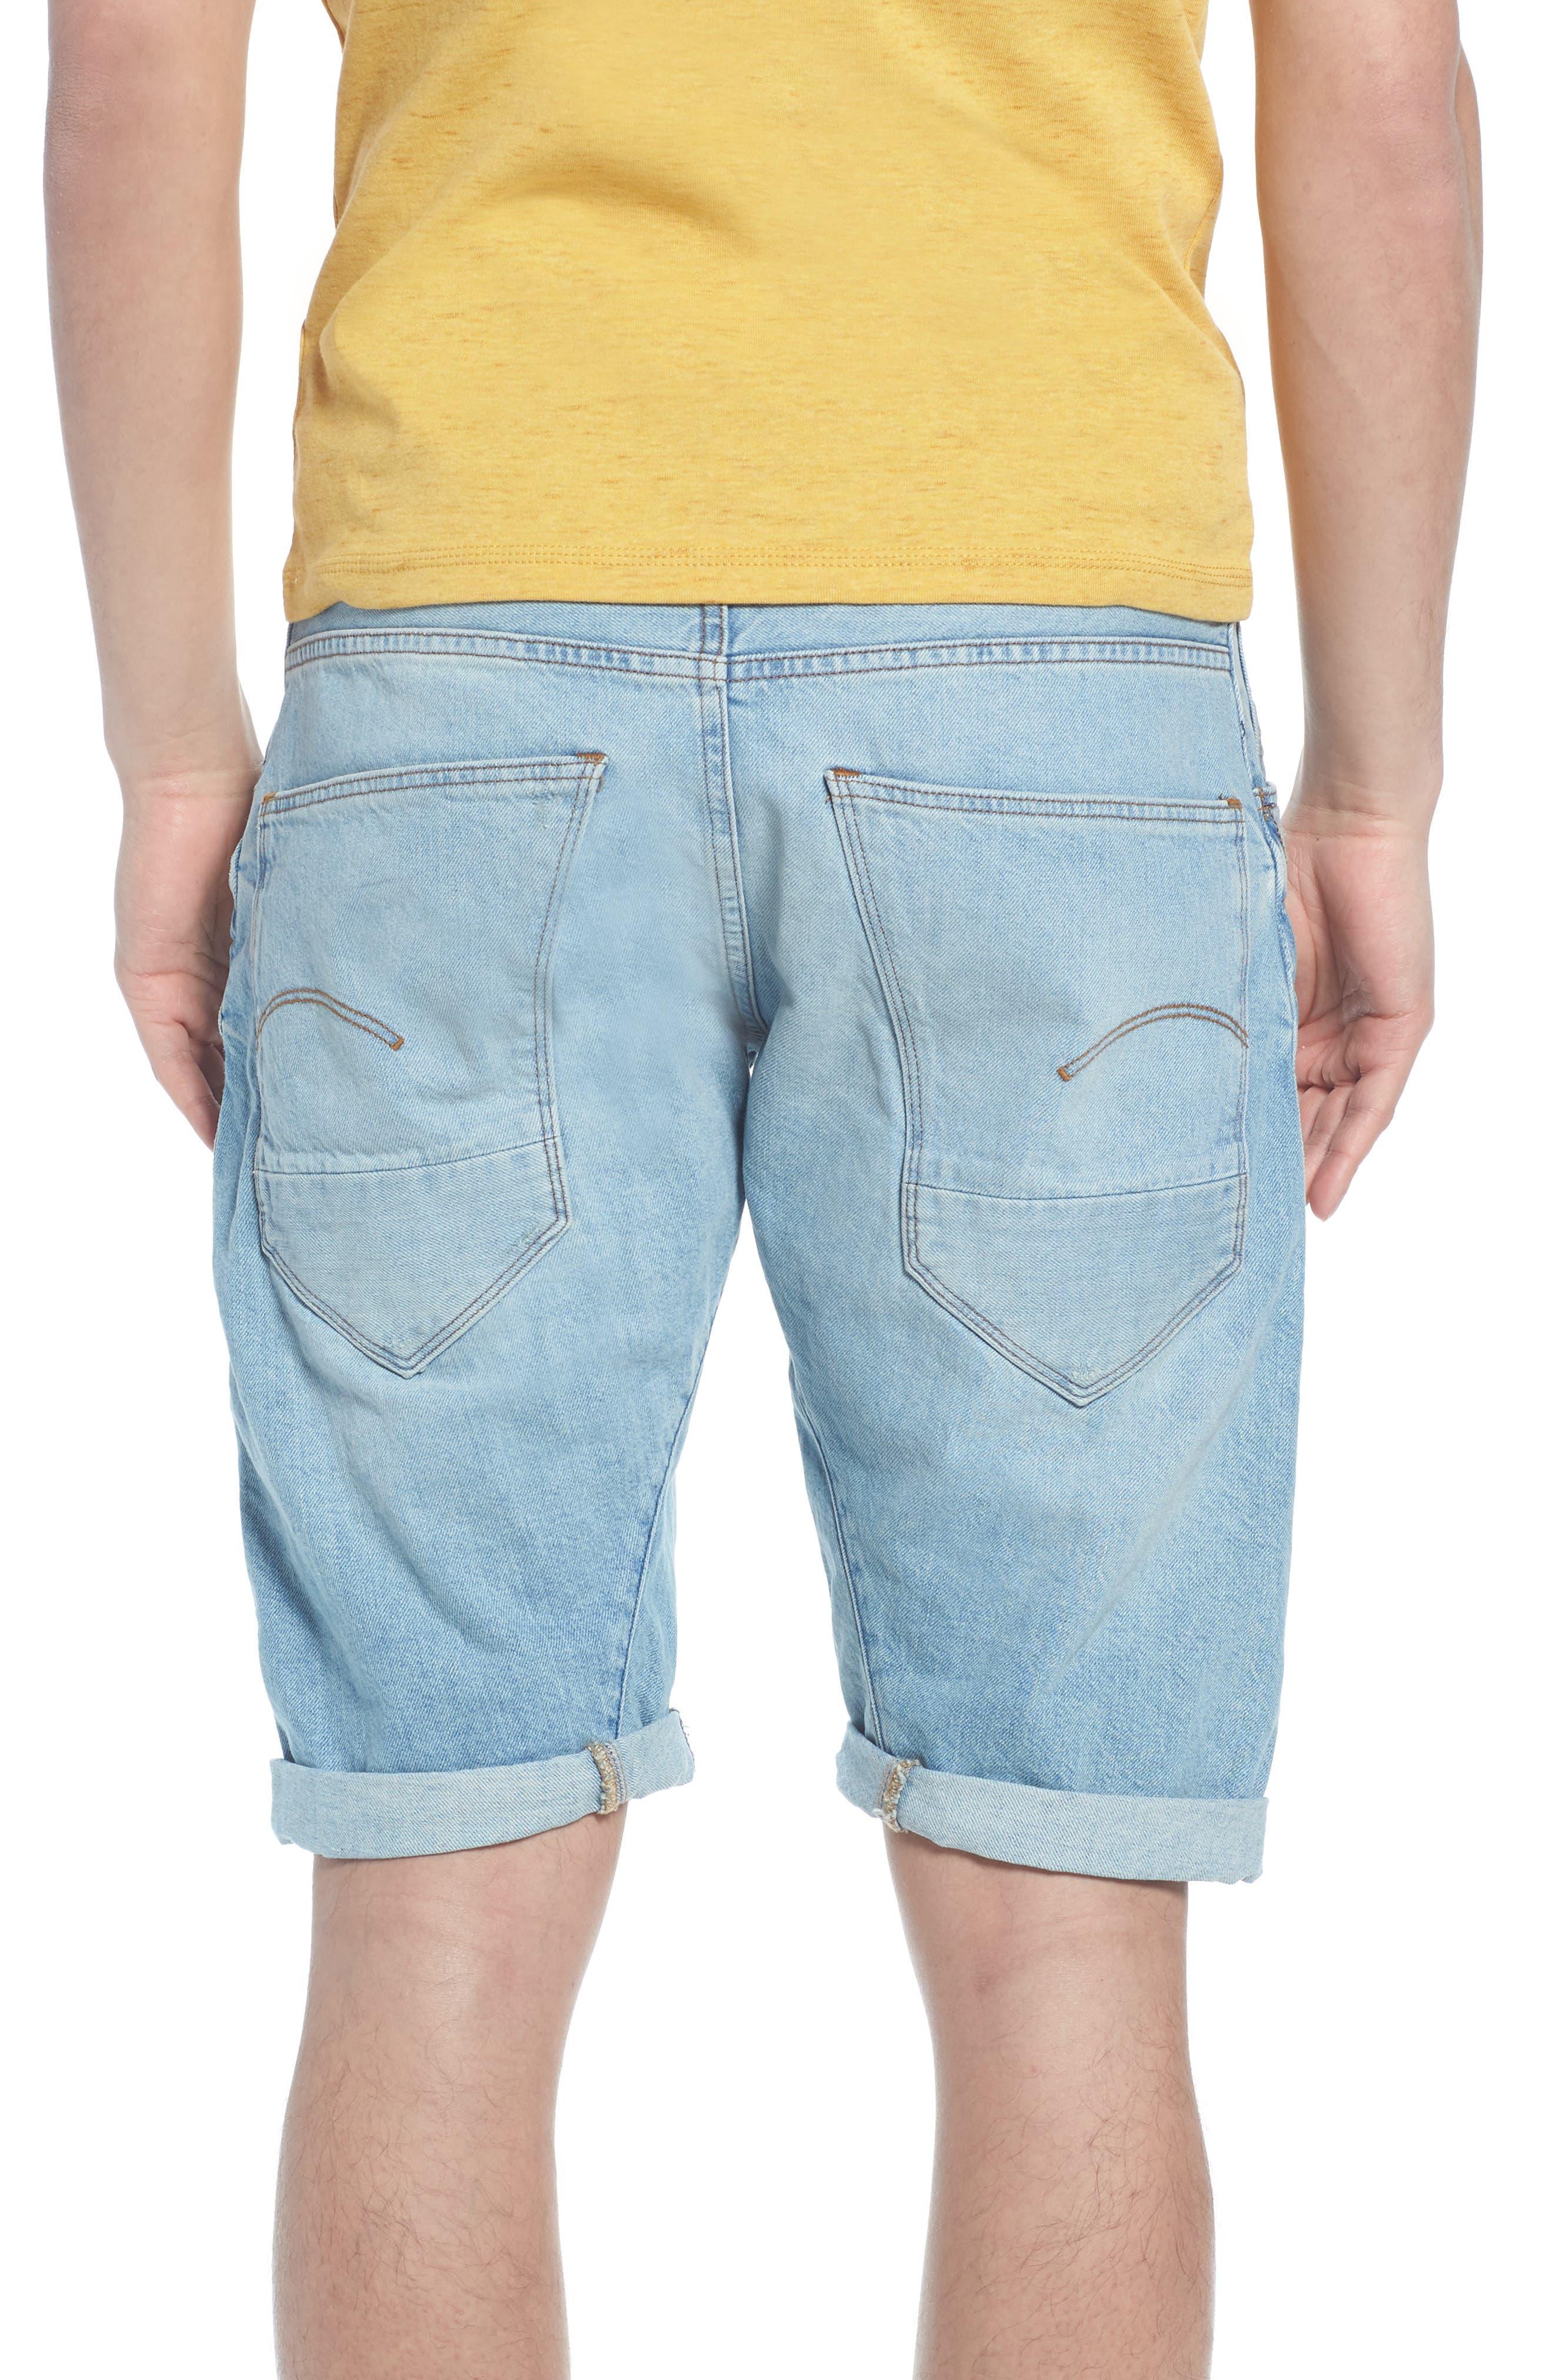 Arc 3D Shorts,                             Alternate thumbnail 2, color,                             Light Aged Blue